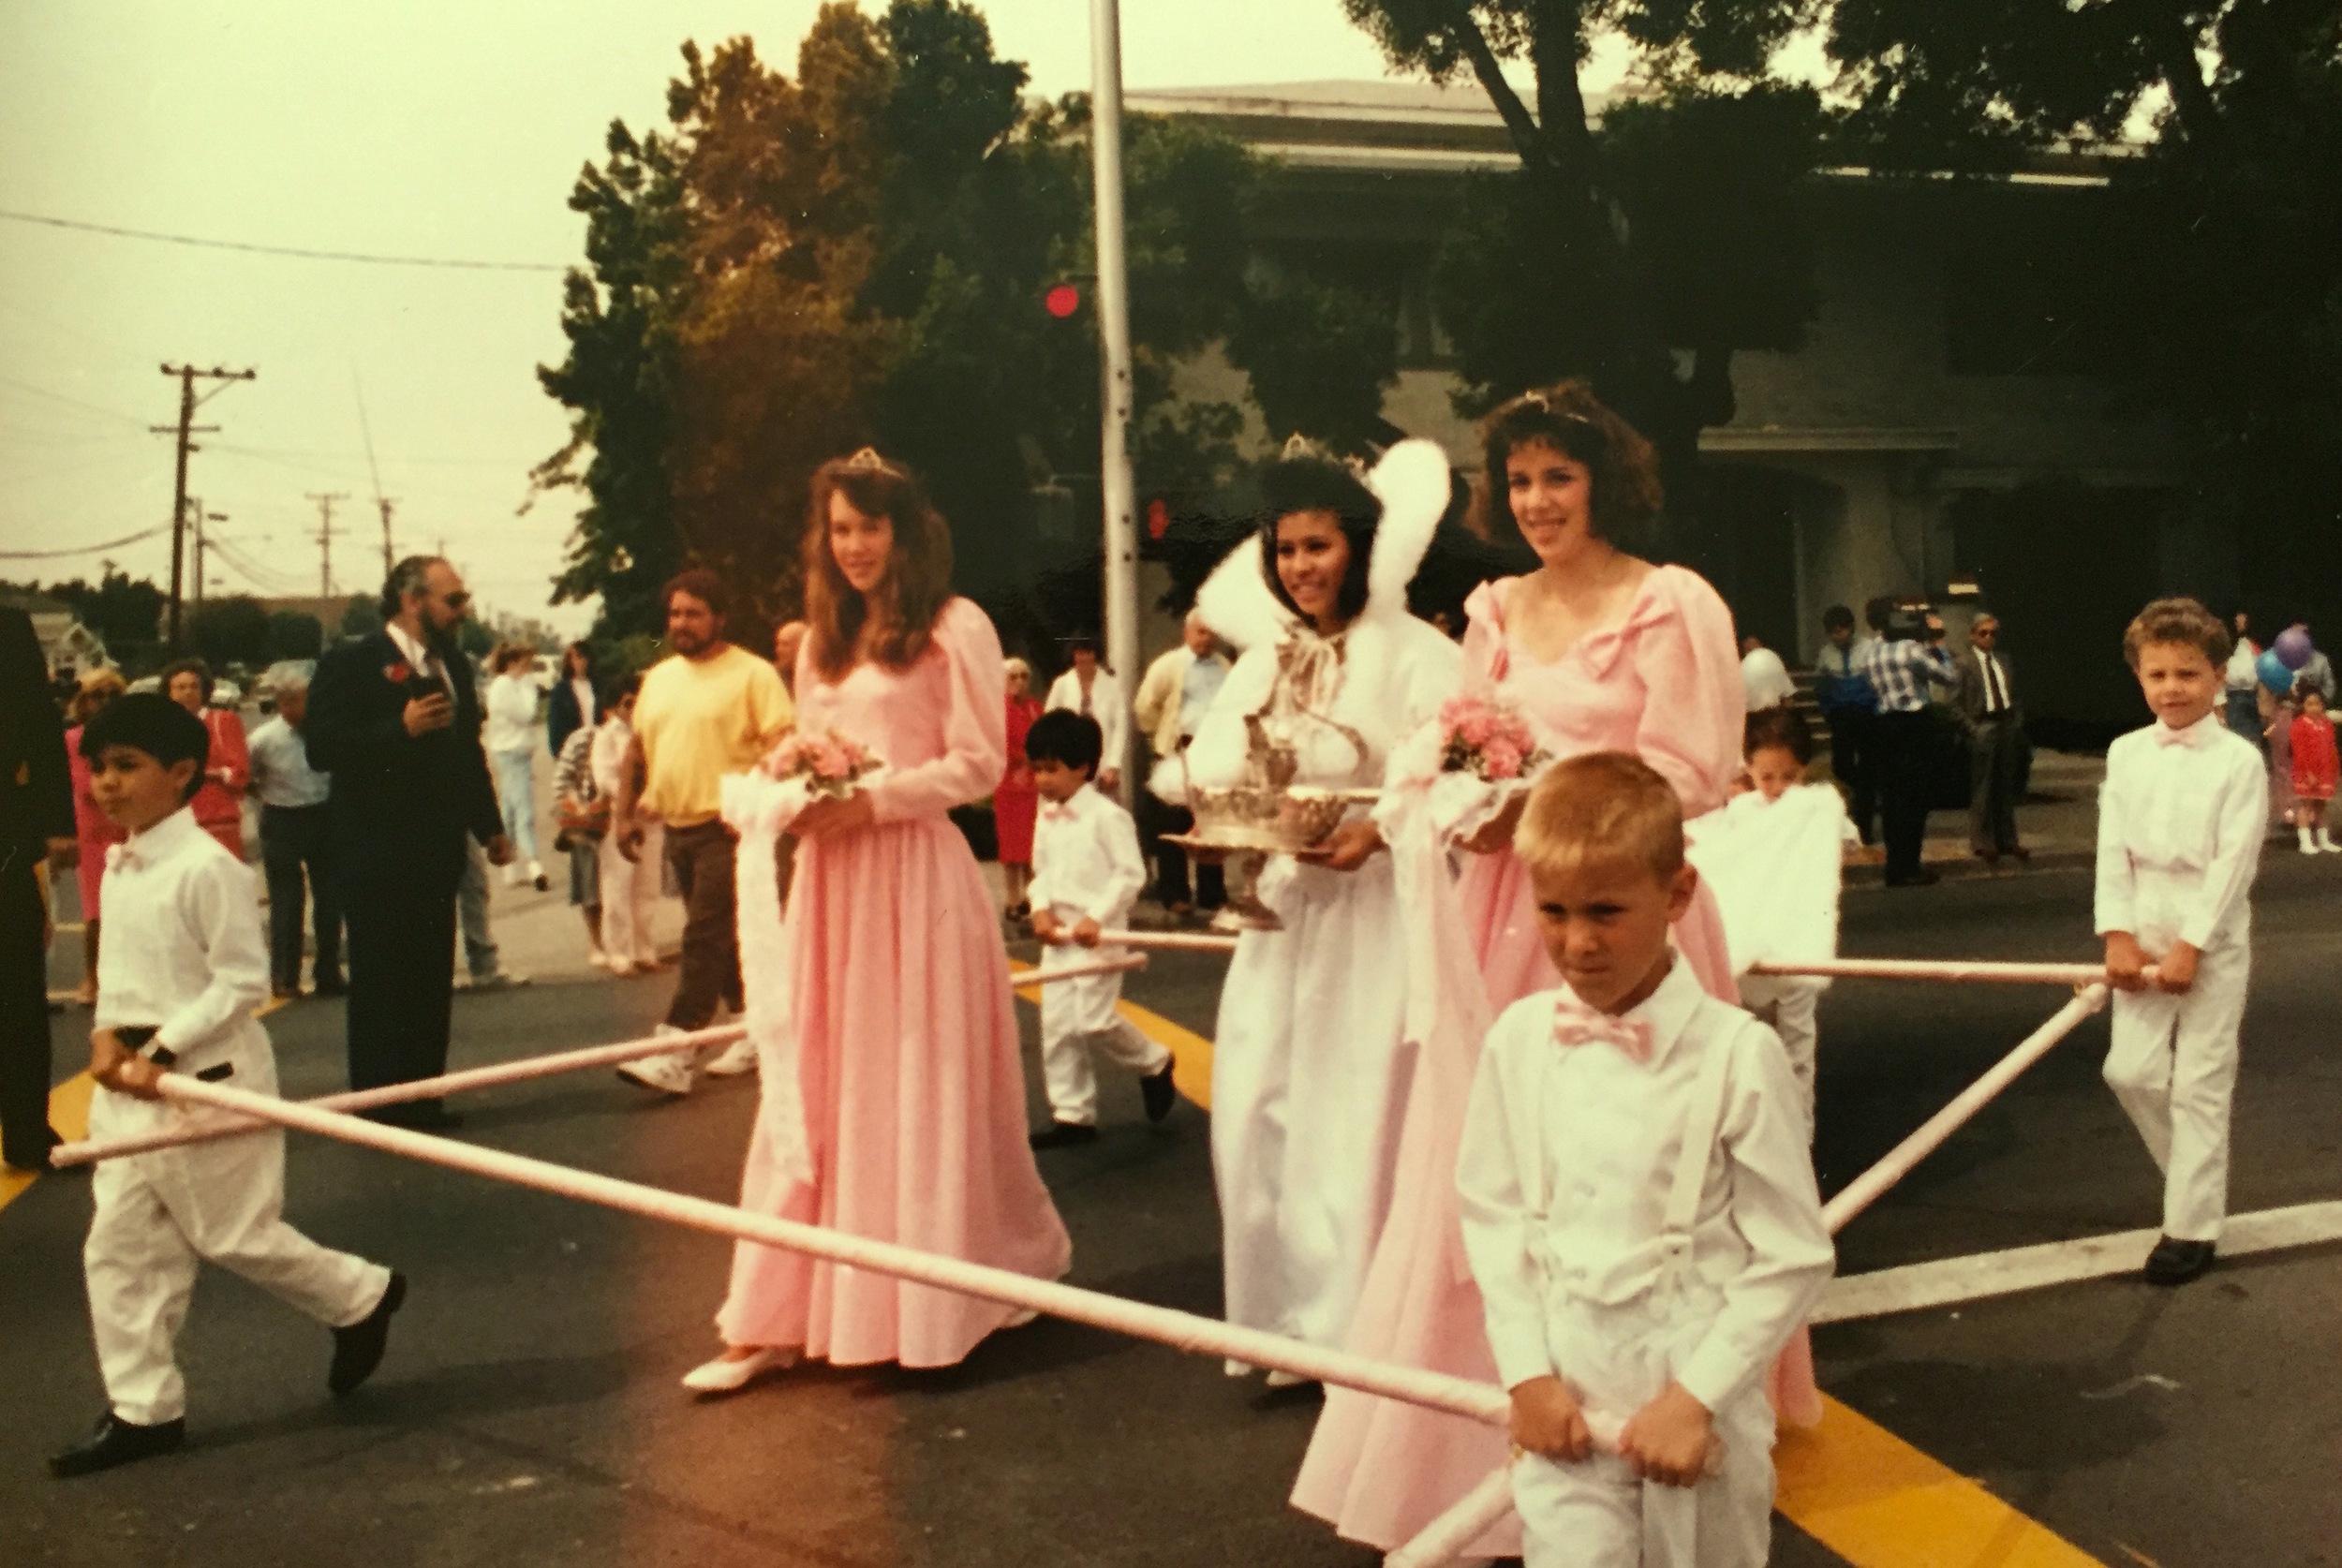 1988 Festival Queen   - Christina Bautista Mangonon     Sidemaids - Nicole Franchi &  Keira Wyman Bauer